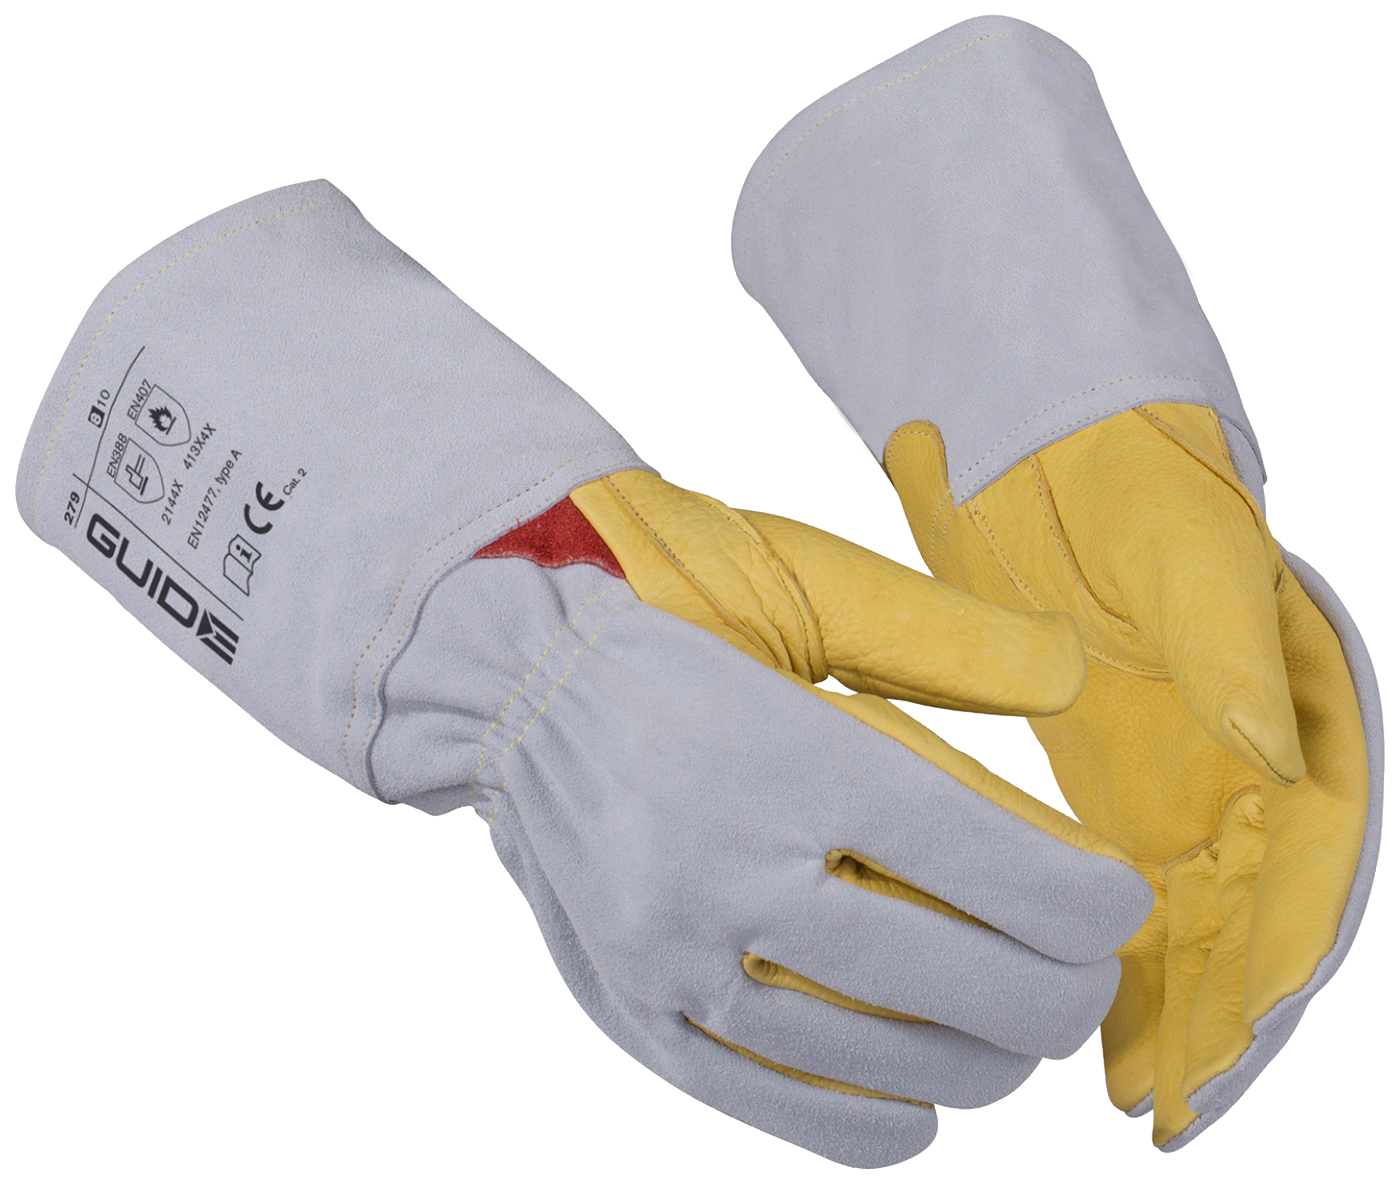 Welding glove GUIDE 279